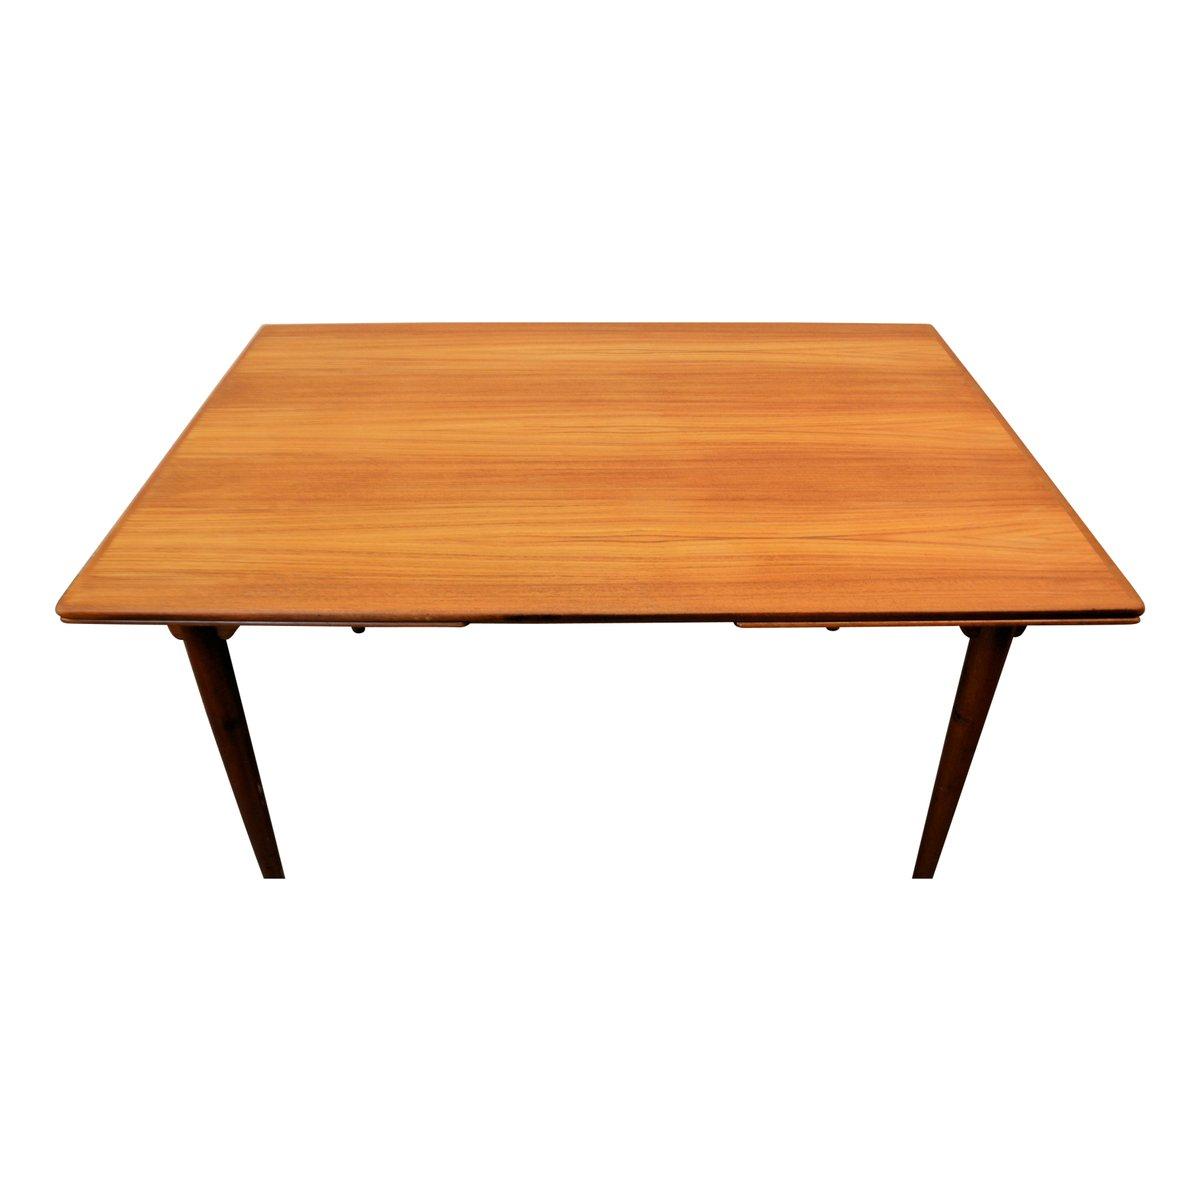 Danish Teak Extendable Dining Table from Omann Juns  : danish teak extendable dining table from omann juns mobelfabrik 1960s 7 from www.pamono.com size 1200 x 1200 jpeg 41kB